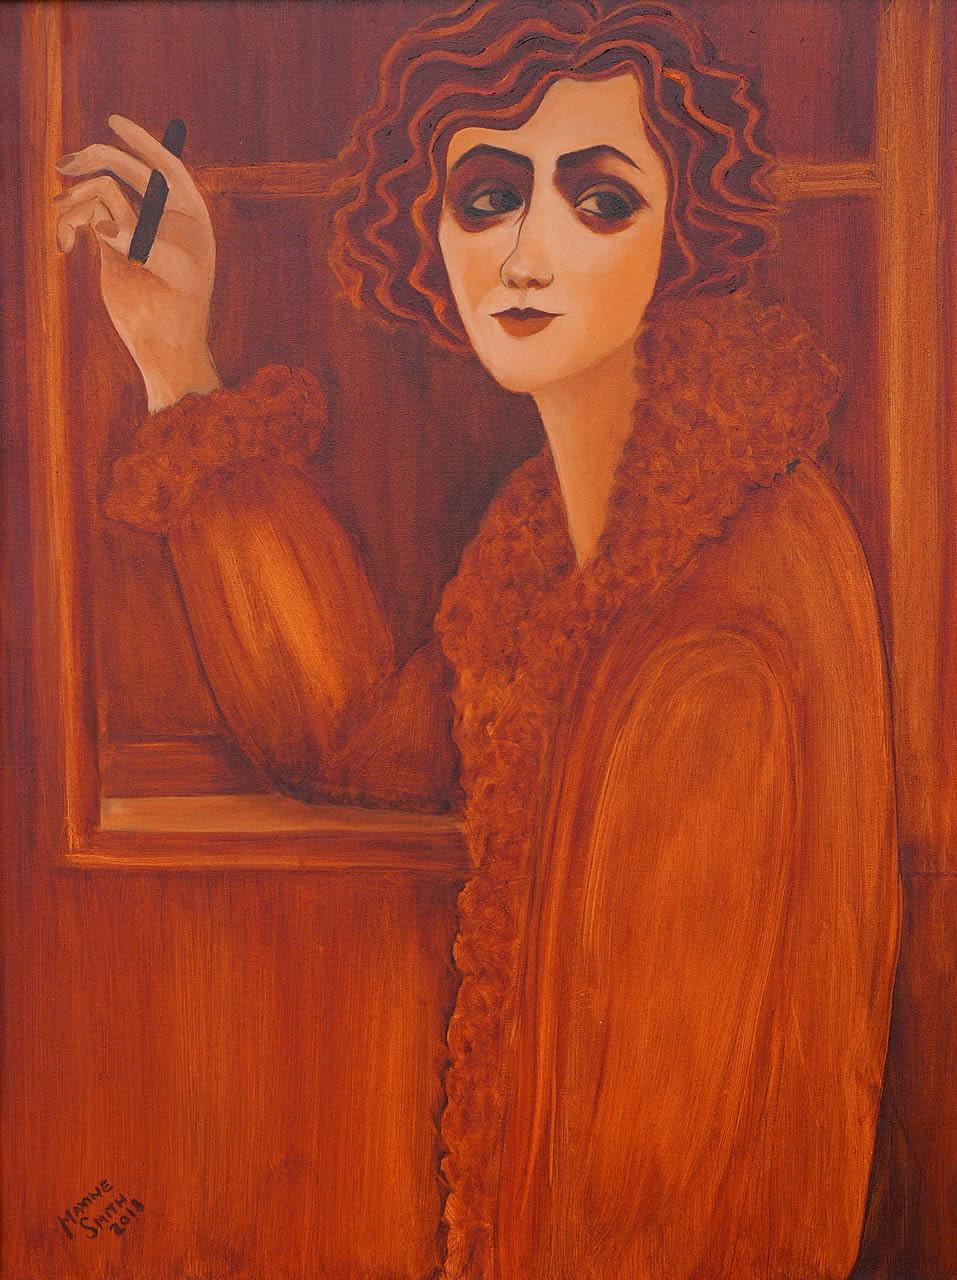 Woman in Fur Trimmed Coat